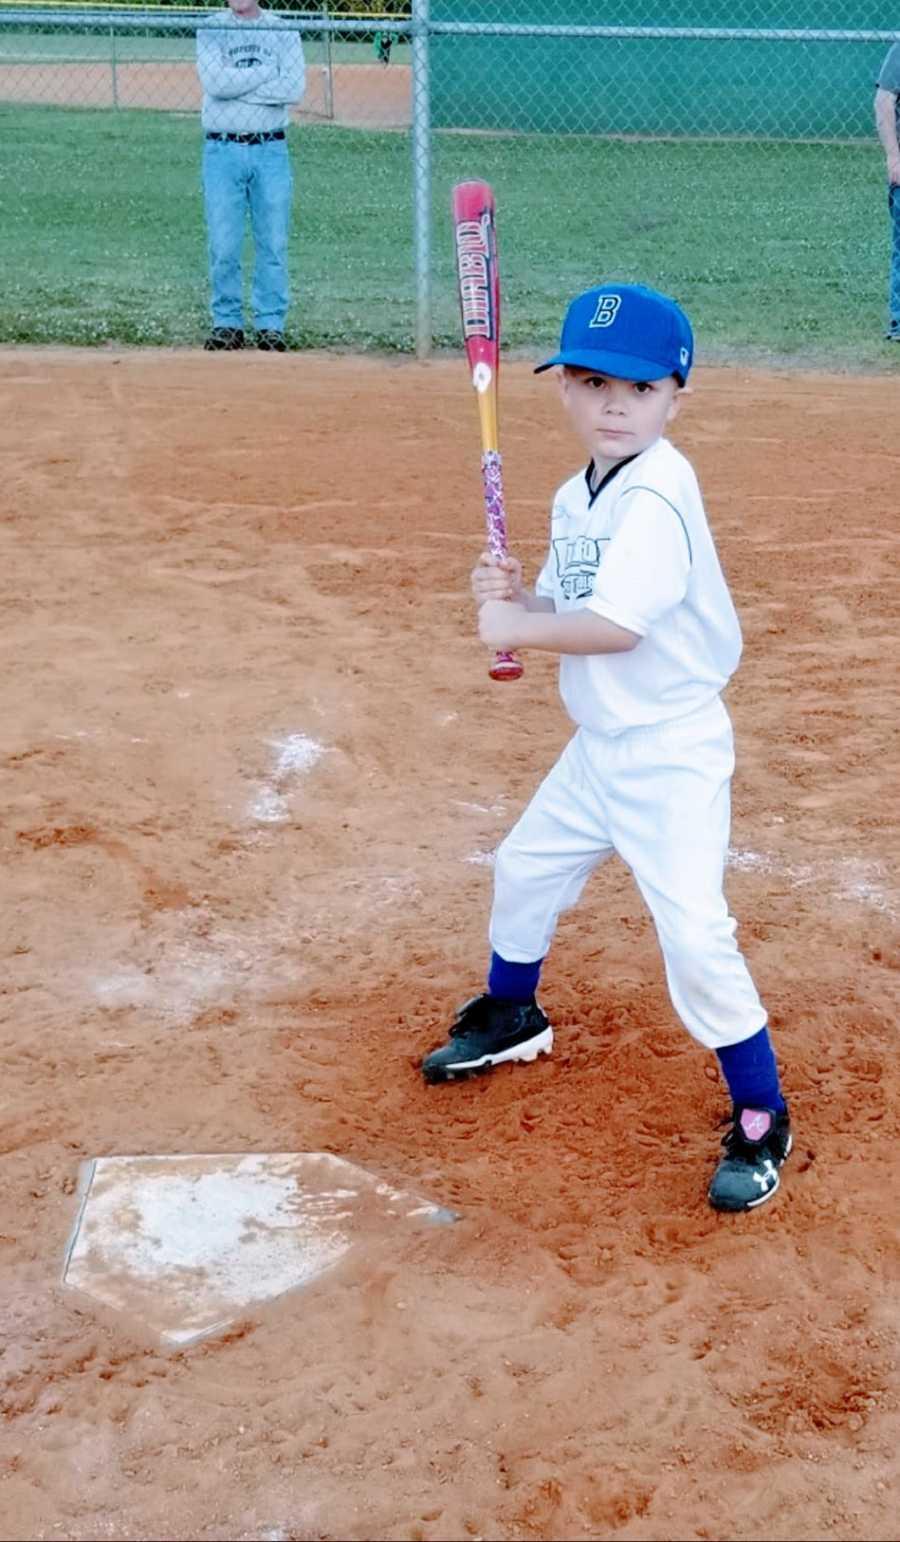 A little boy stands at home plate holding a bat